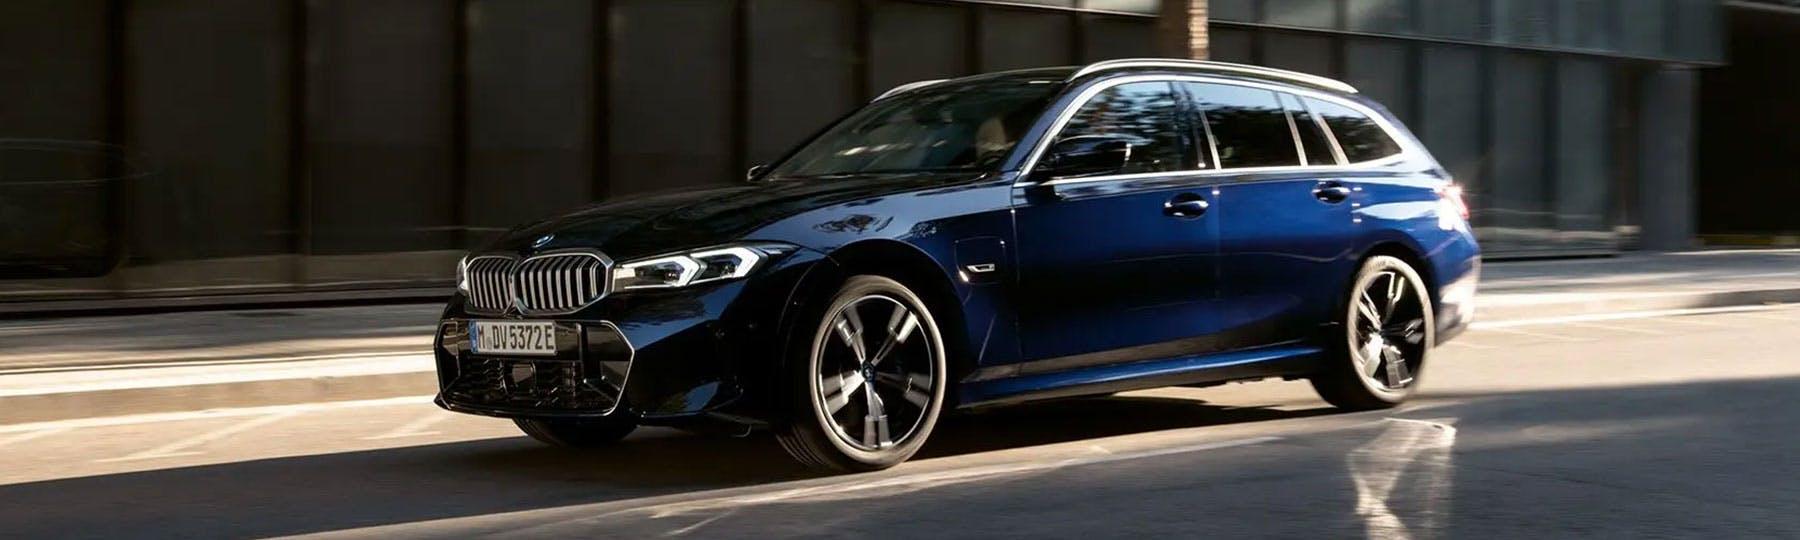 New BMW 3 Series Touring Motability